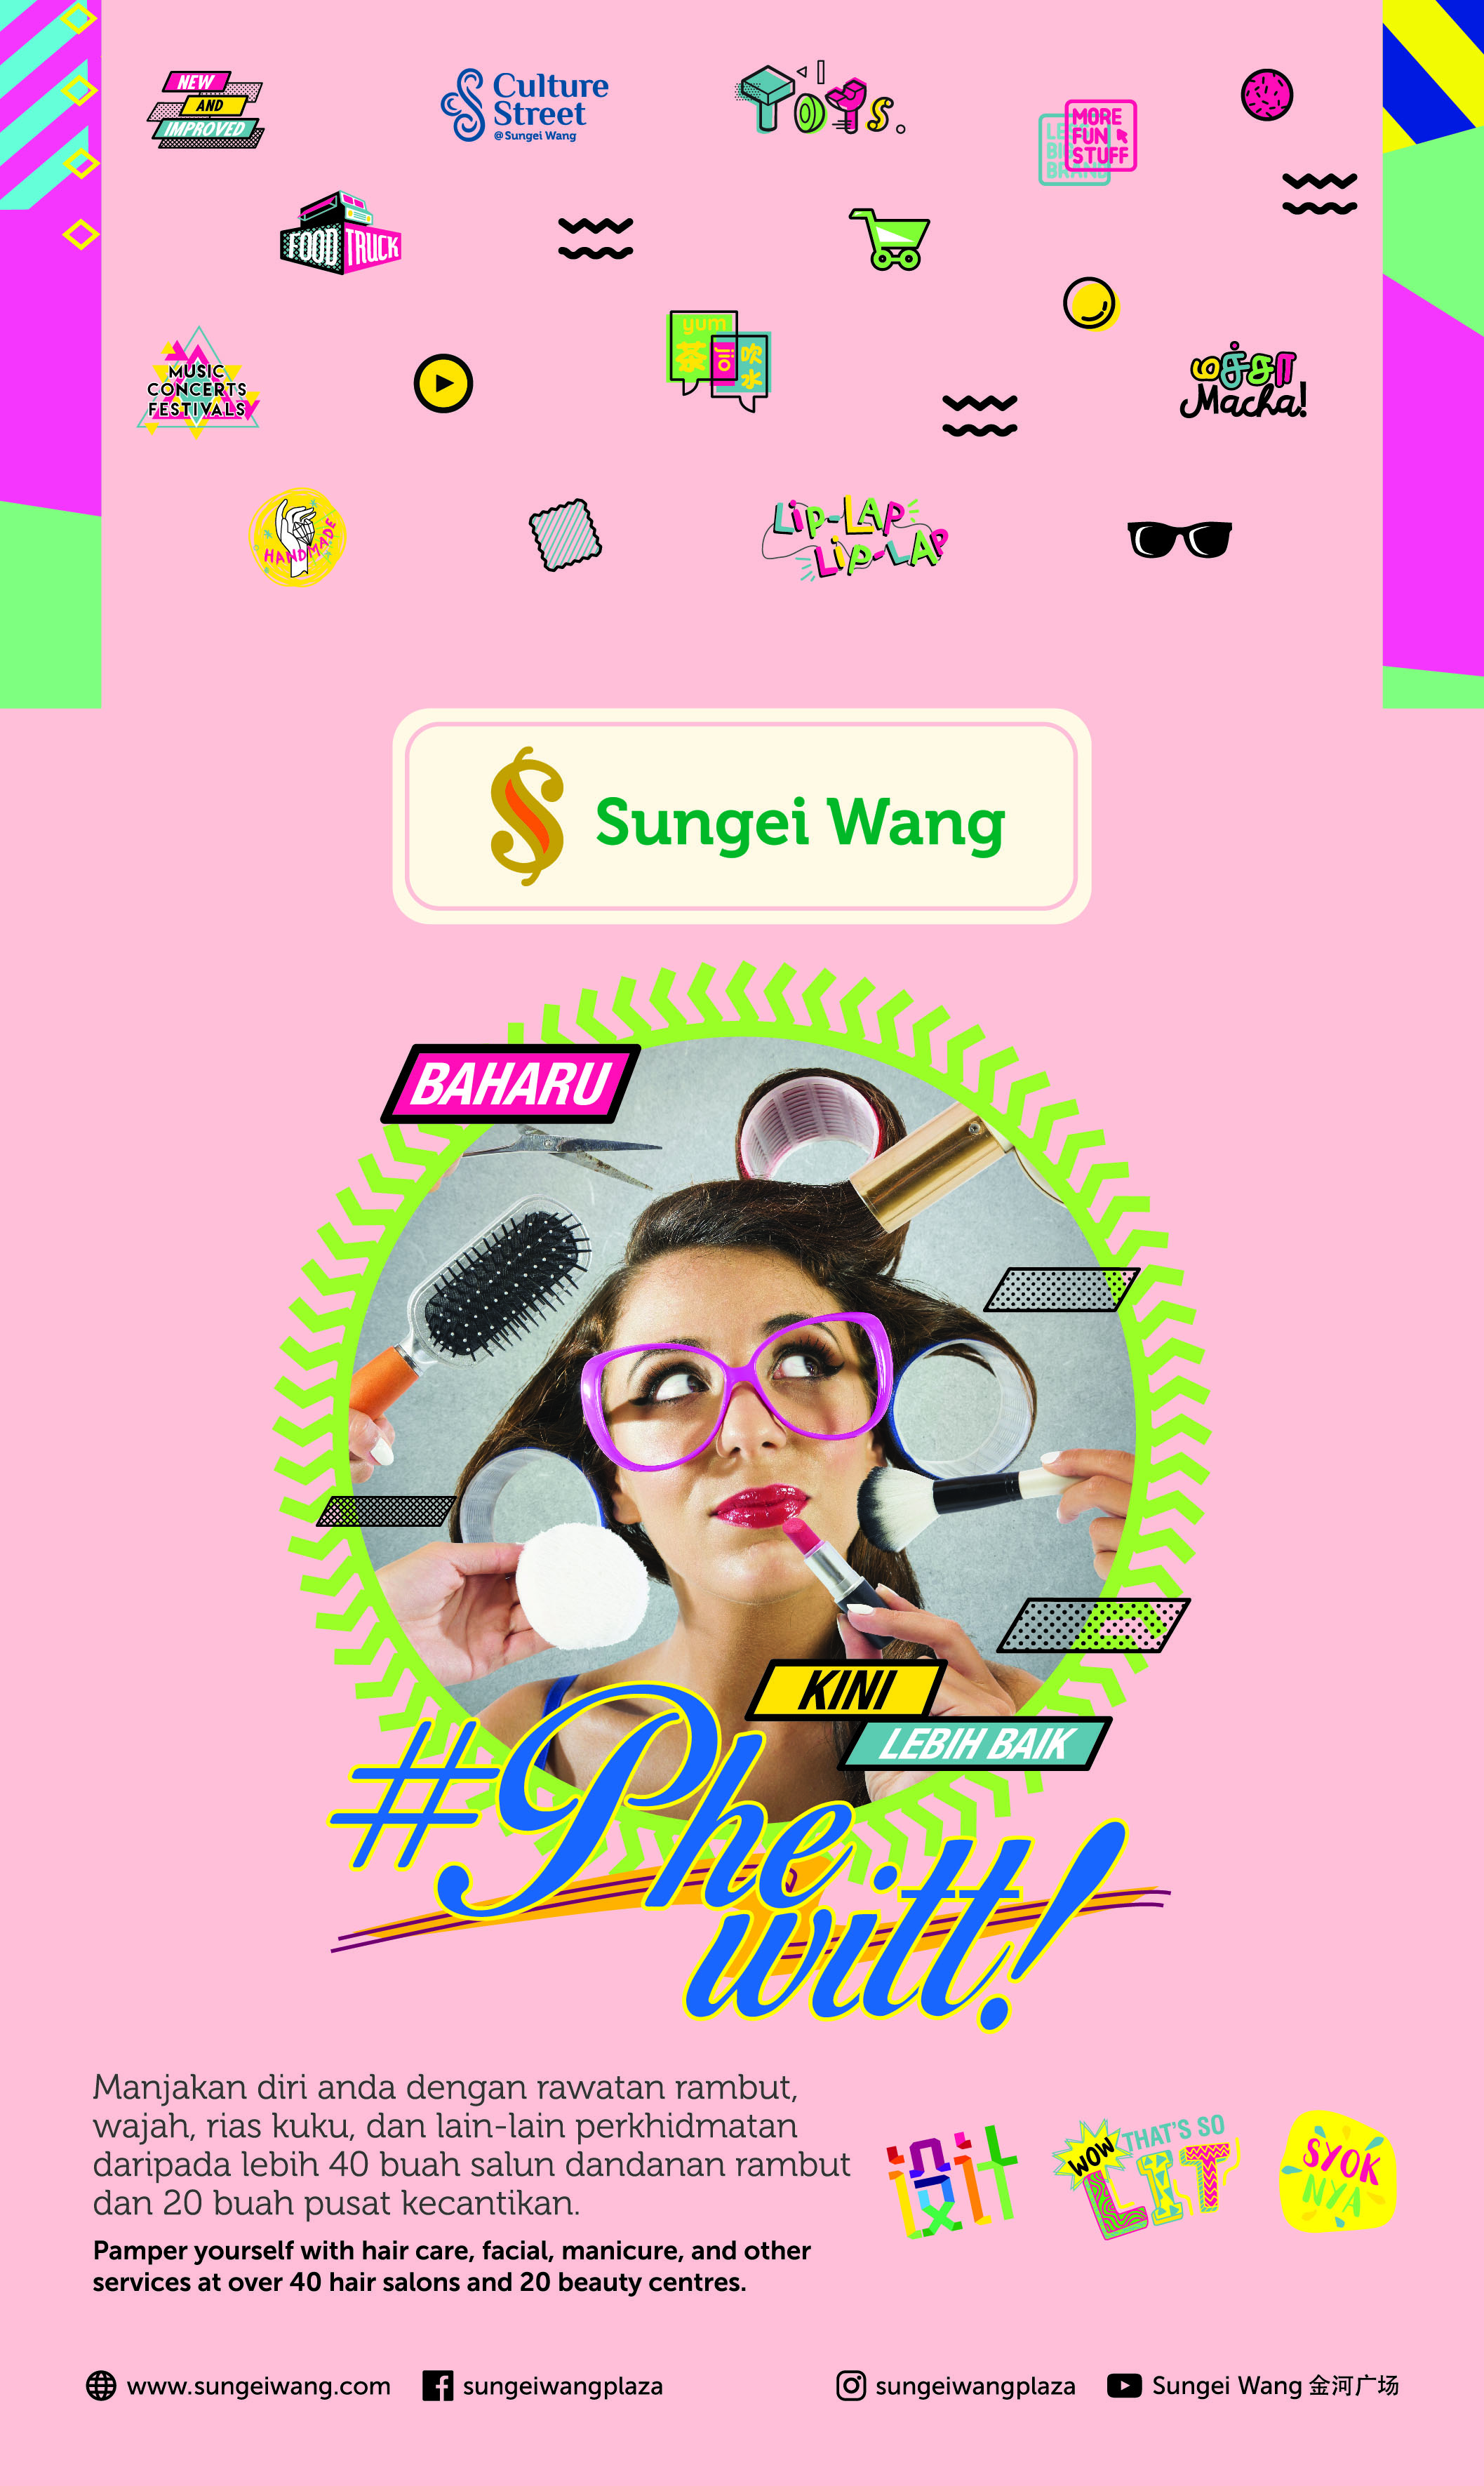 whwWeb_SW_Poster_MRT 2.jpg